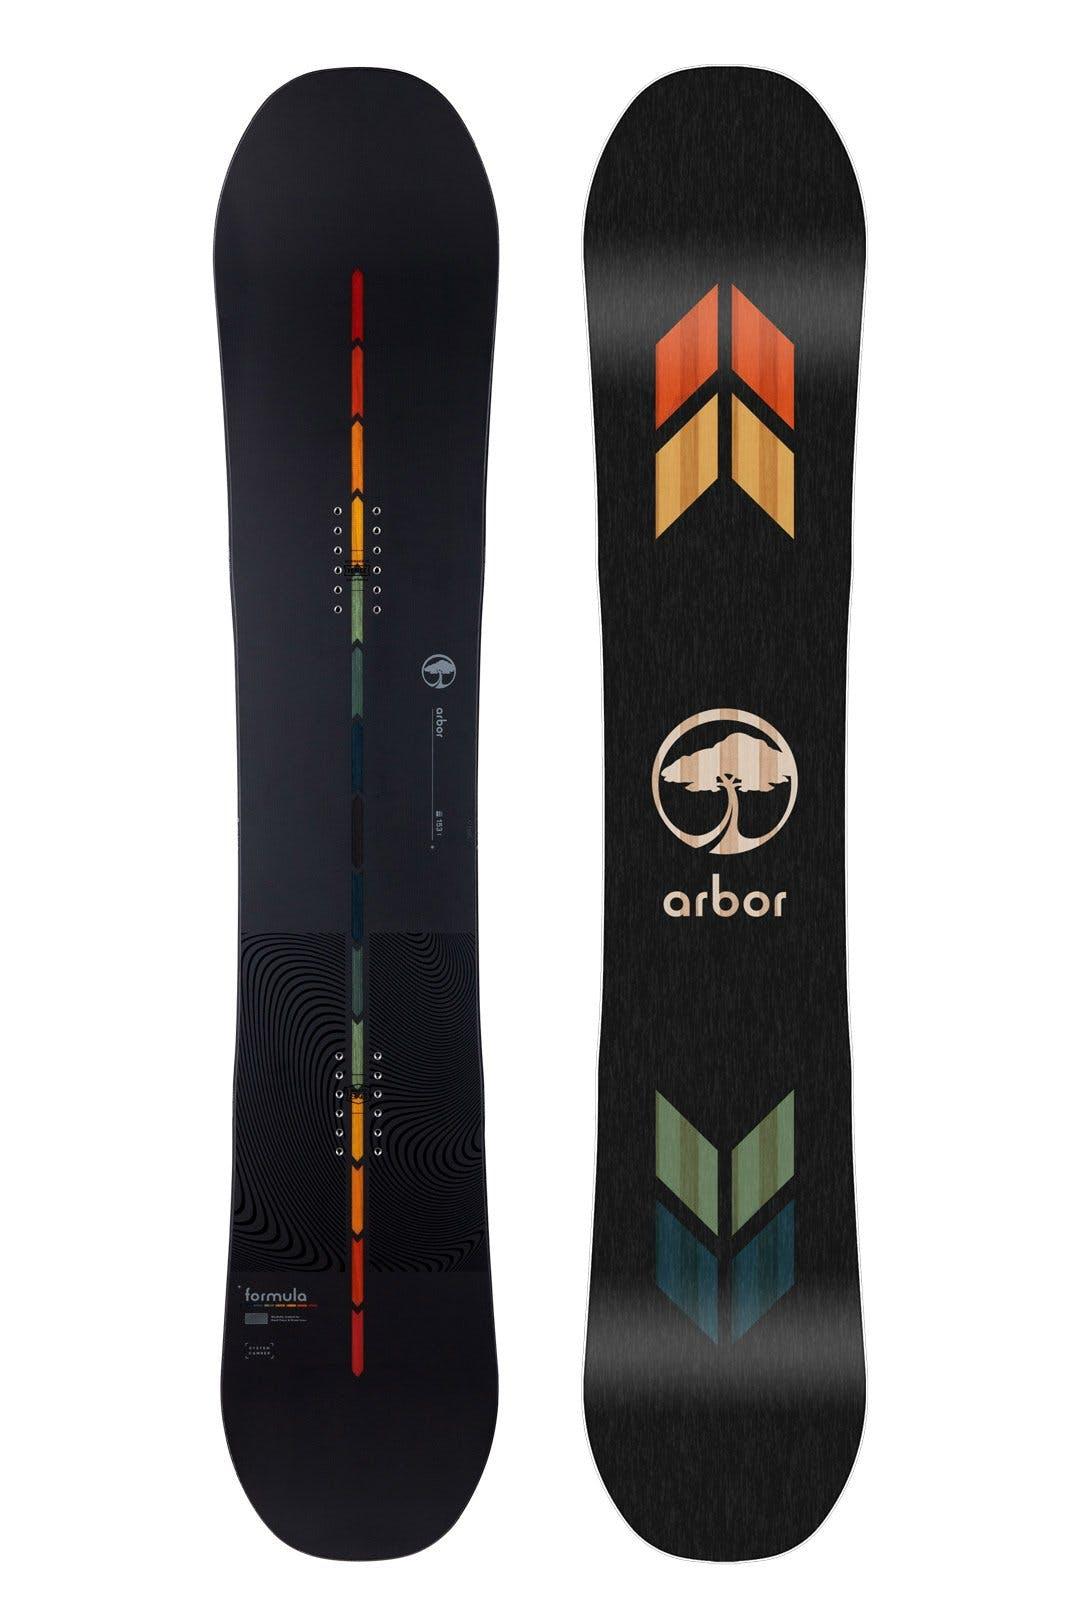 Arbor Formula Camber Snowboard · 2022